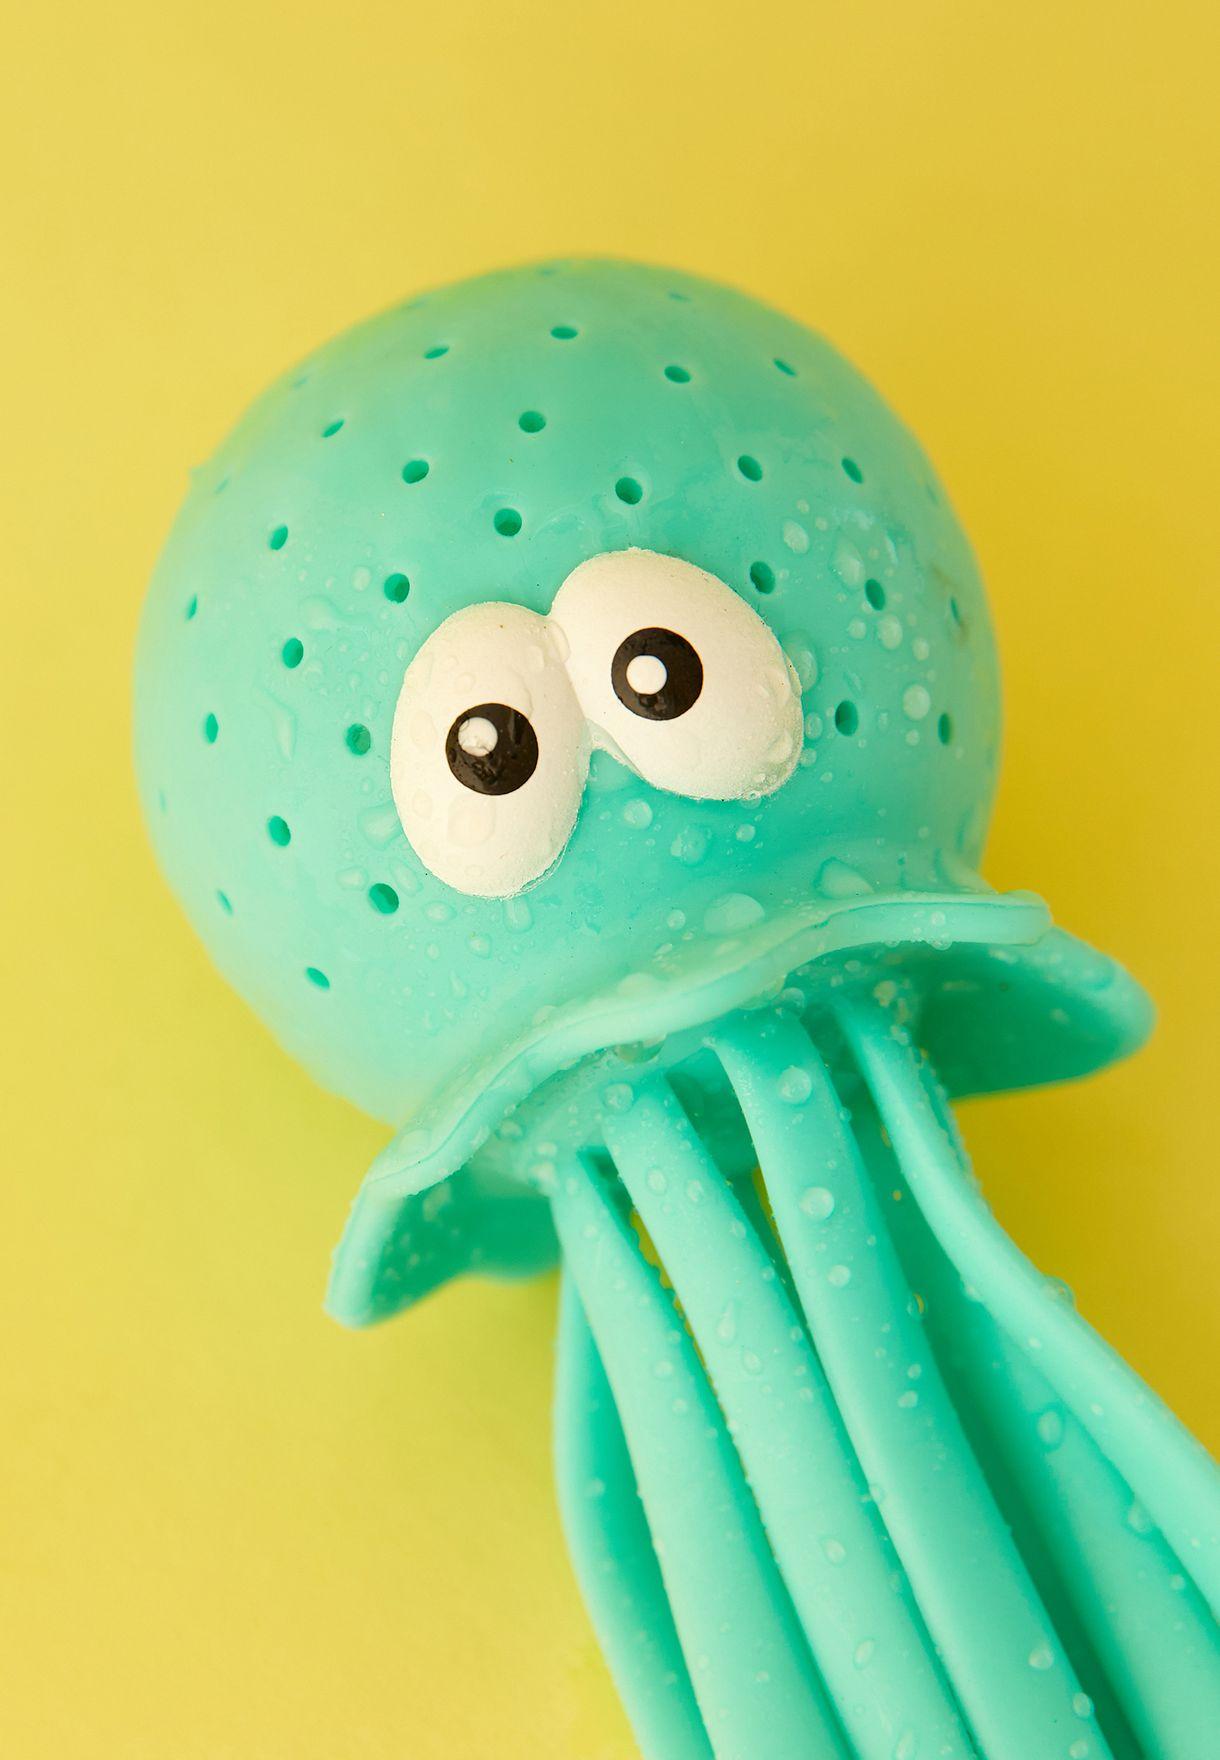 Octopus Bathroom Toy